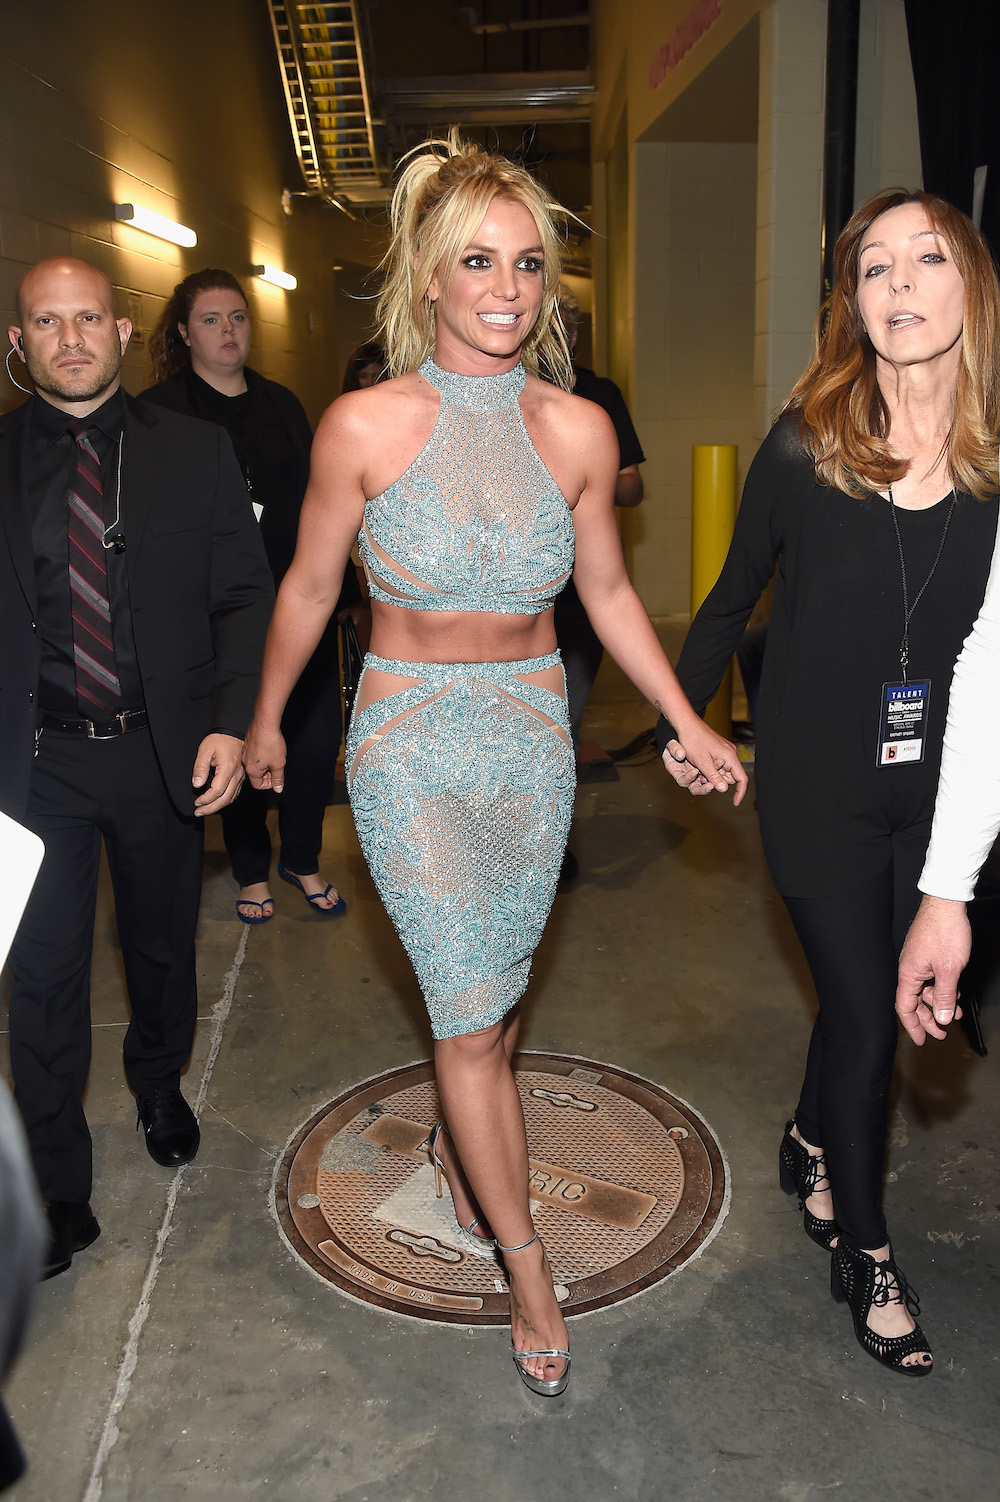 BG_Britney_28329.jpg